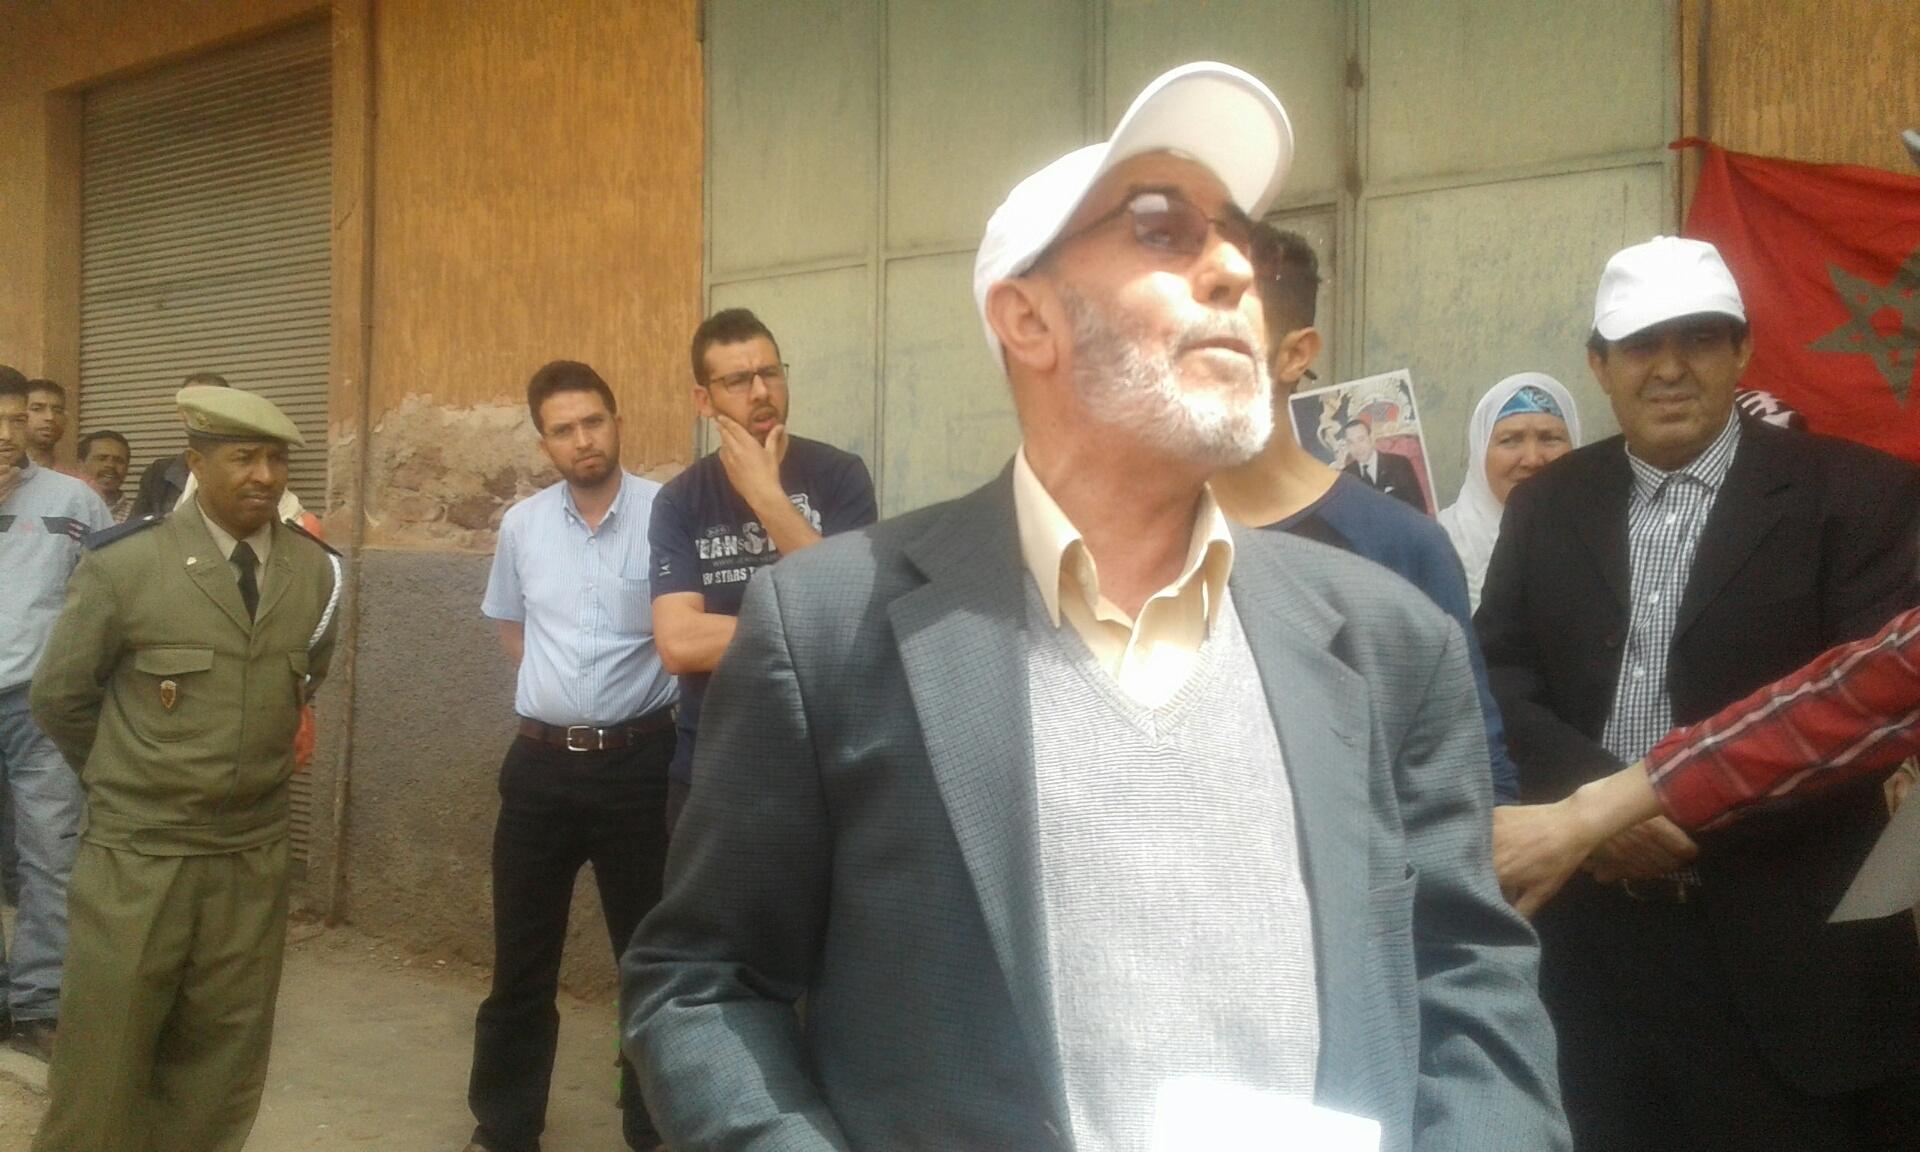 Photo of تنفيذ قرار قضائي بالإفراغ بحي أمالو إغريبن في حين يدعى المنفذ عليه امتلاكه للبيت ..!